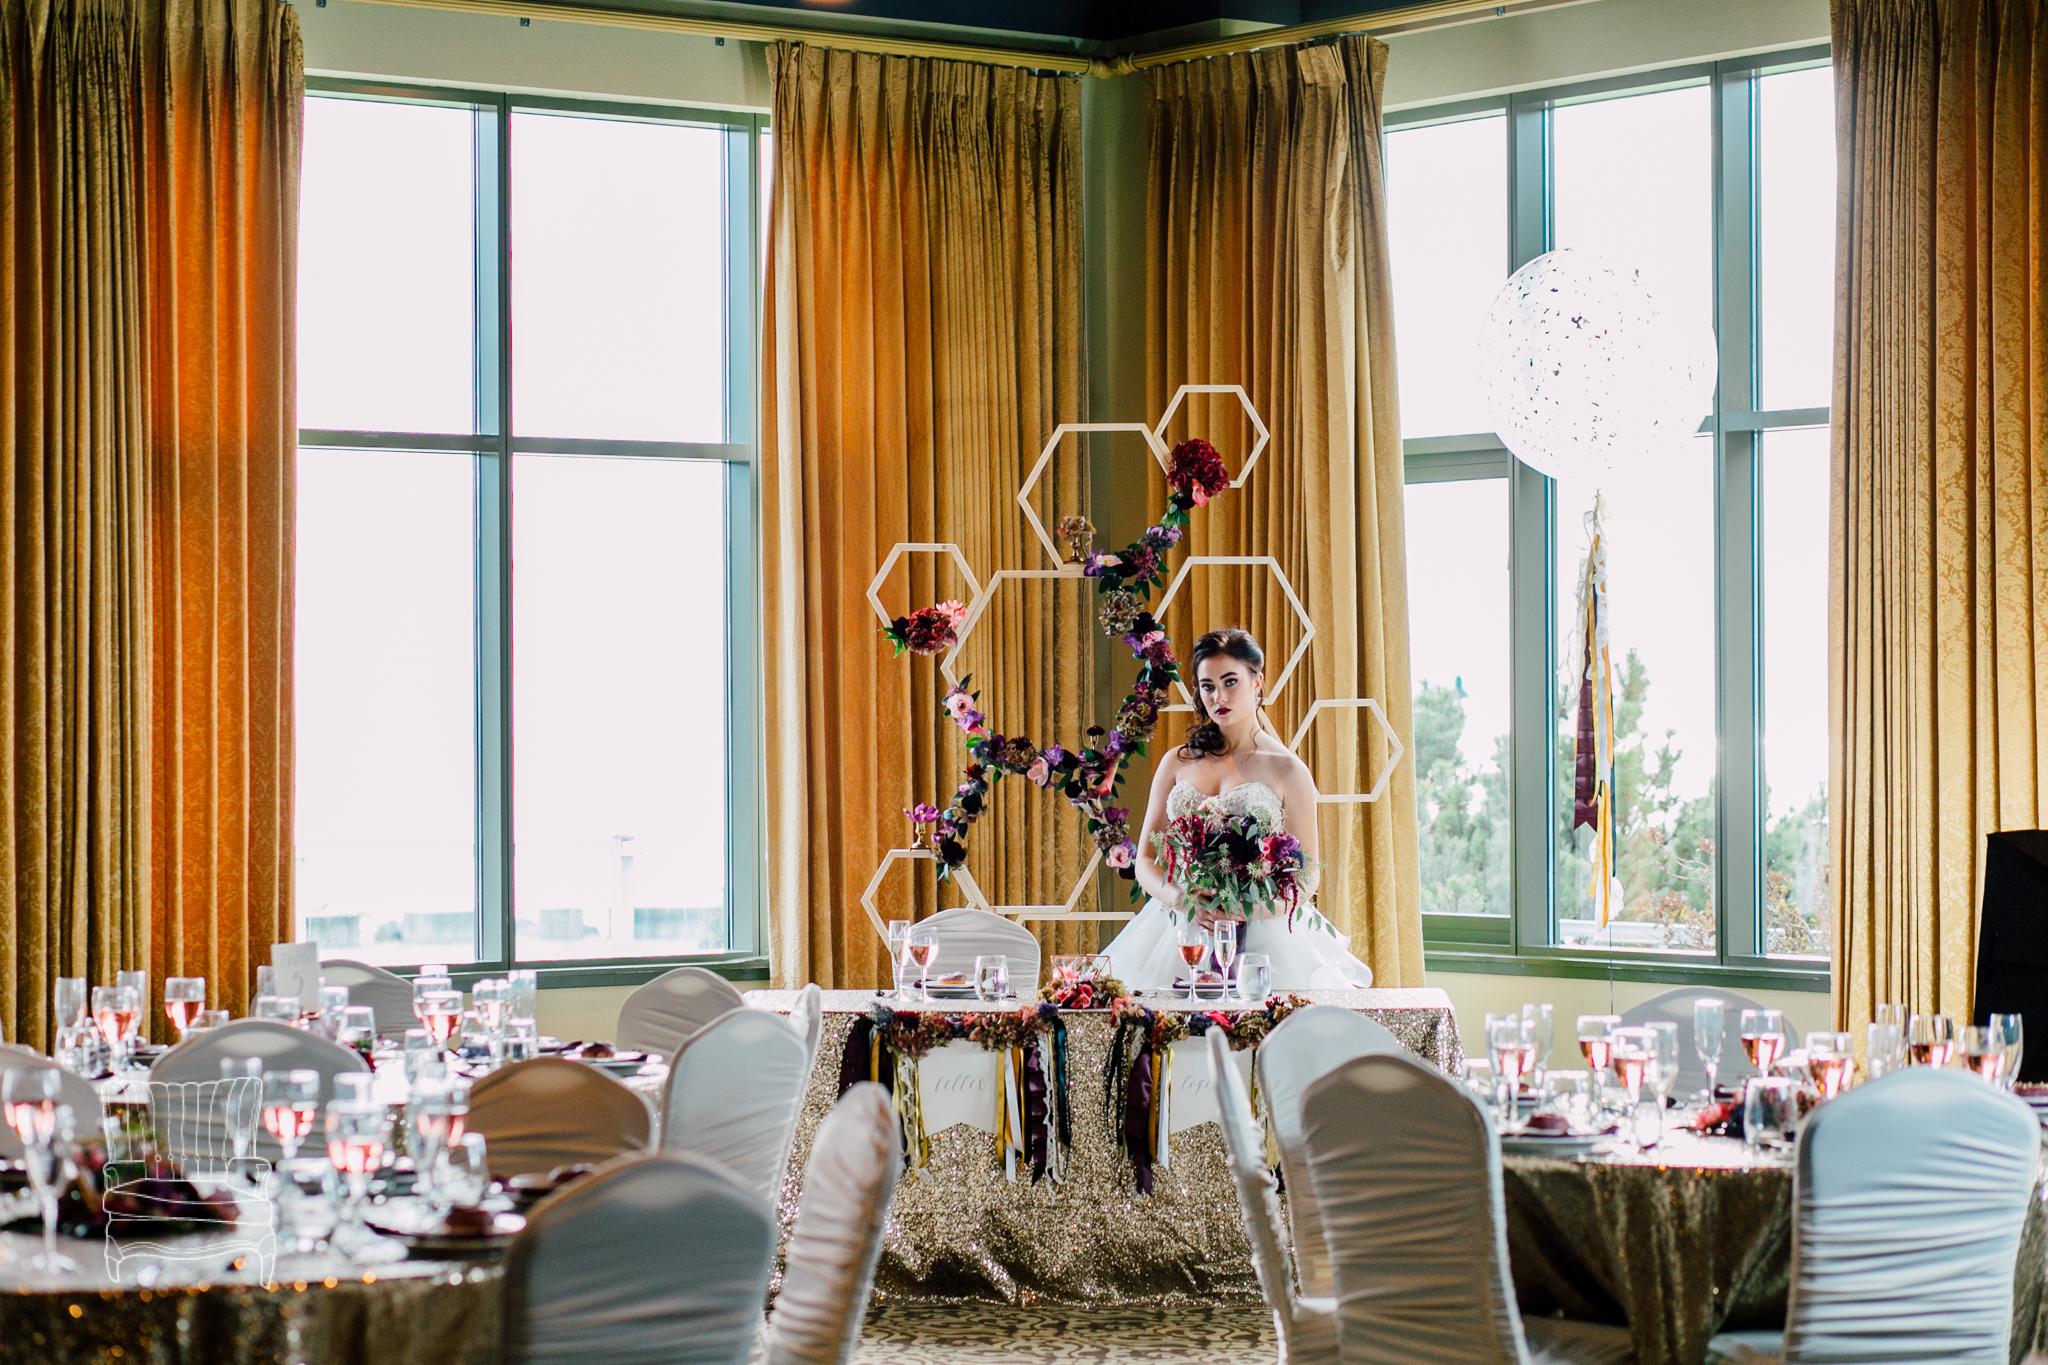 bellwether-bellingham-wedding-styled-katheryn-moran-photography-2-3.jpg